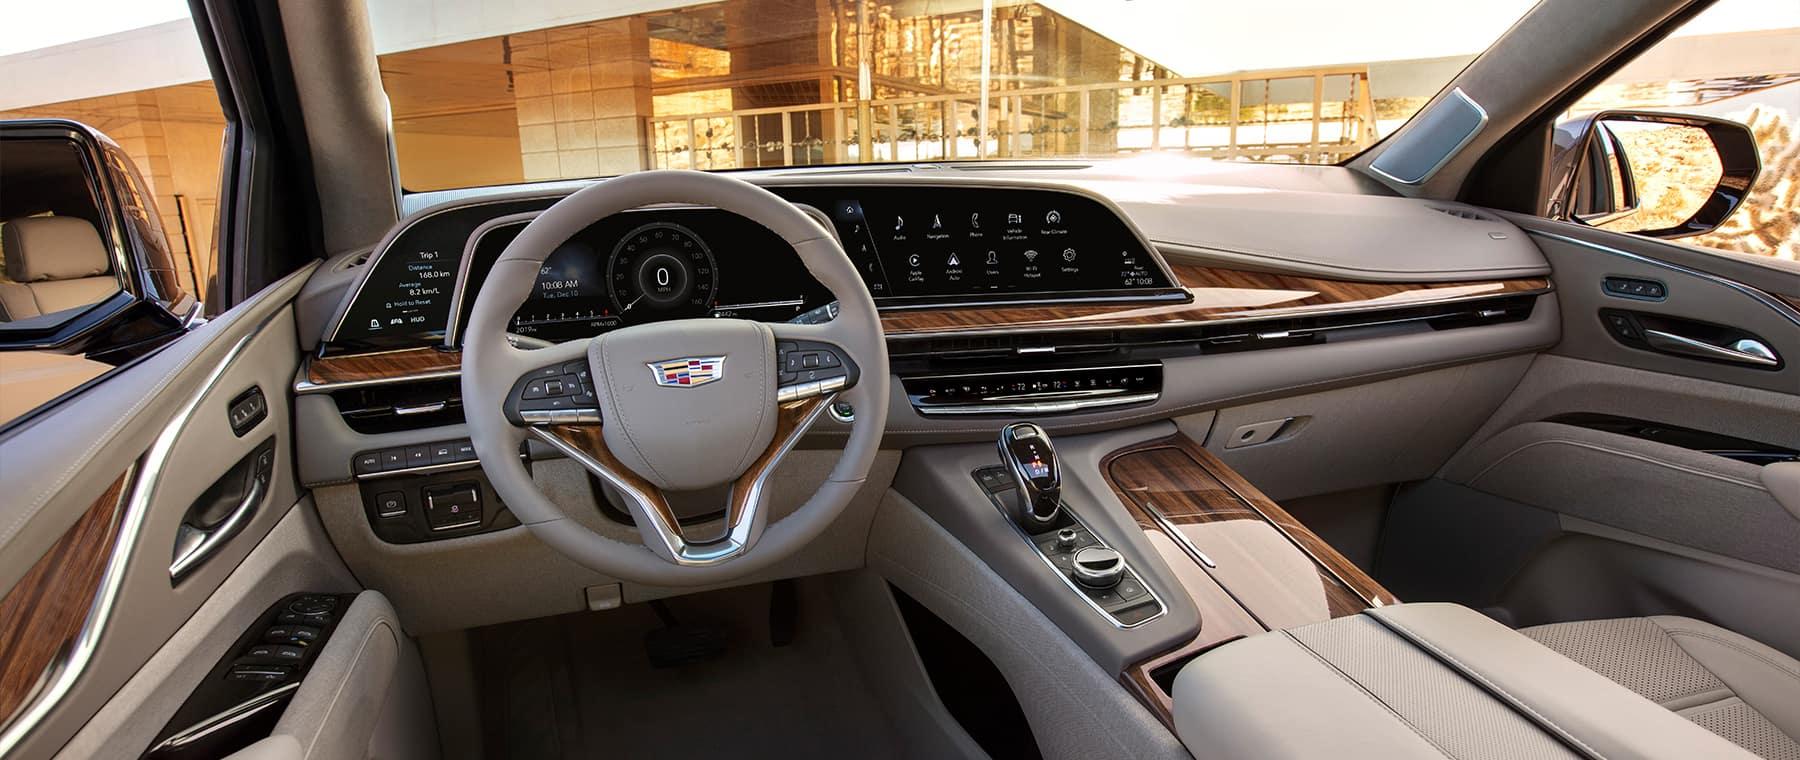 2021 Cadillac Escalade dash board